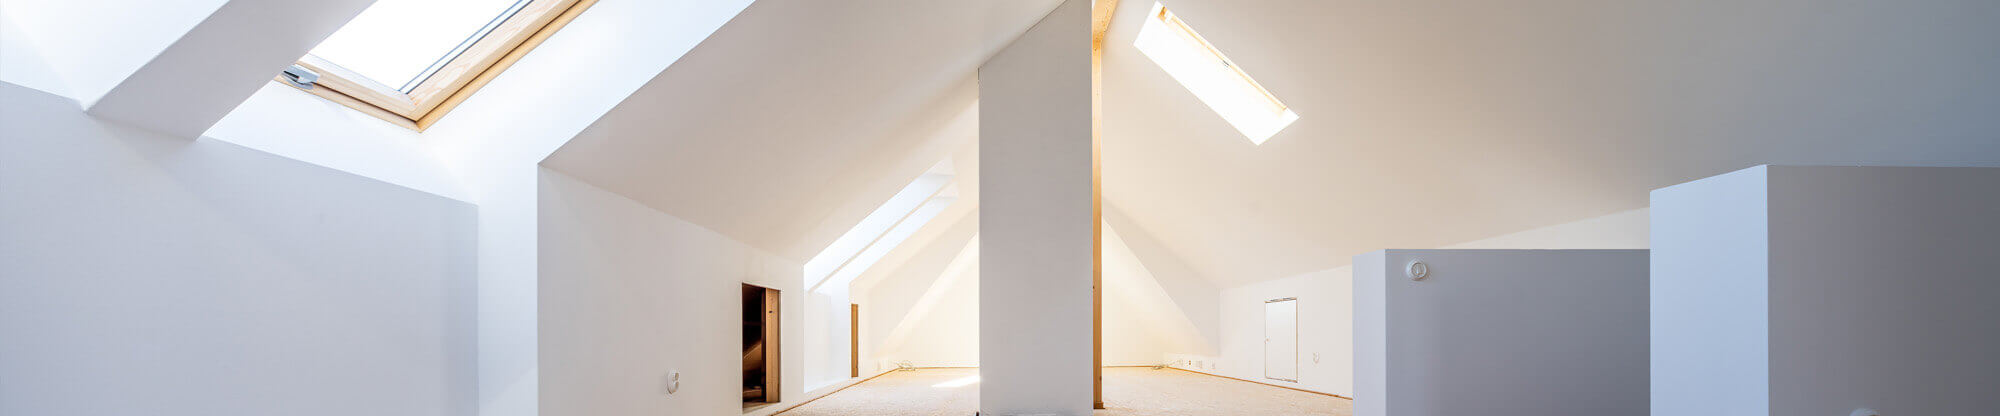 Custom Rooflights